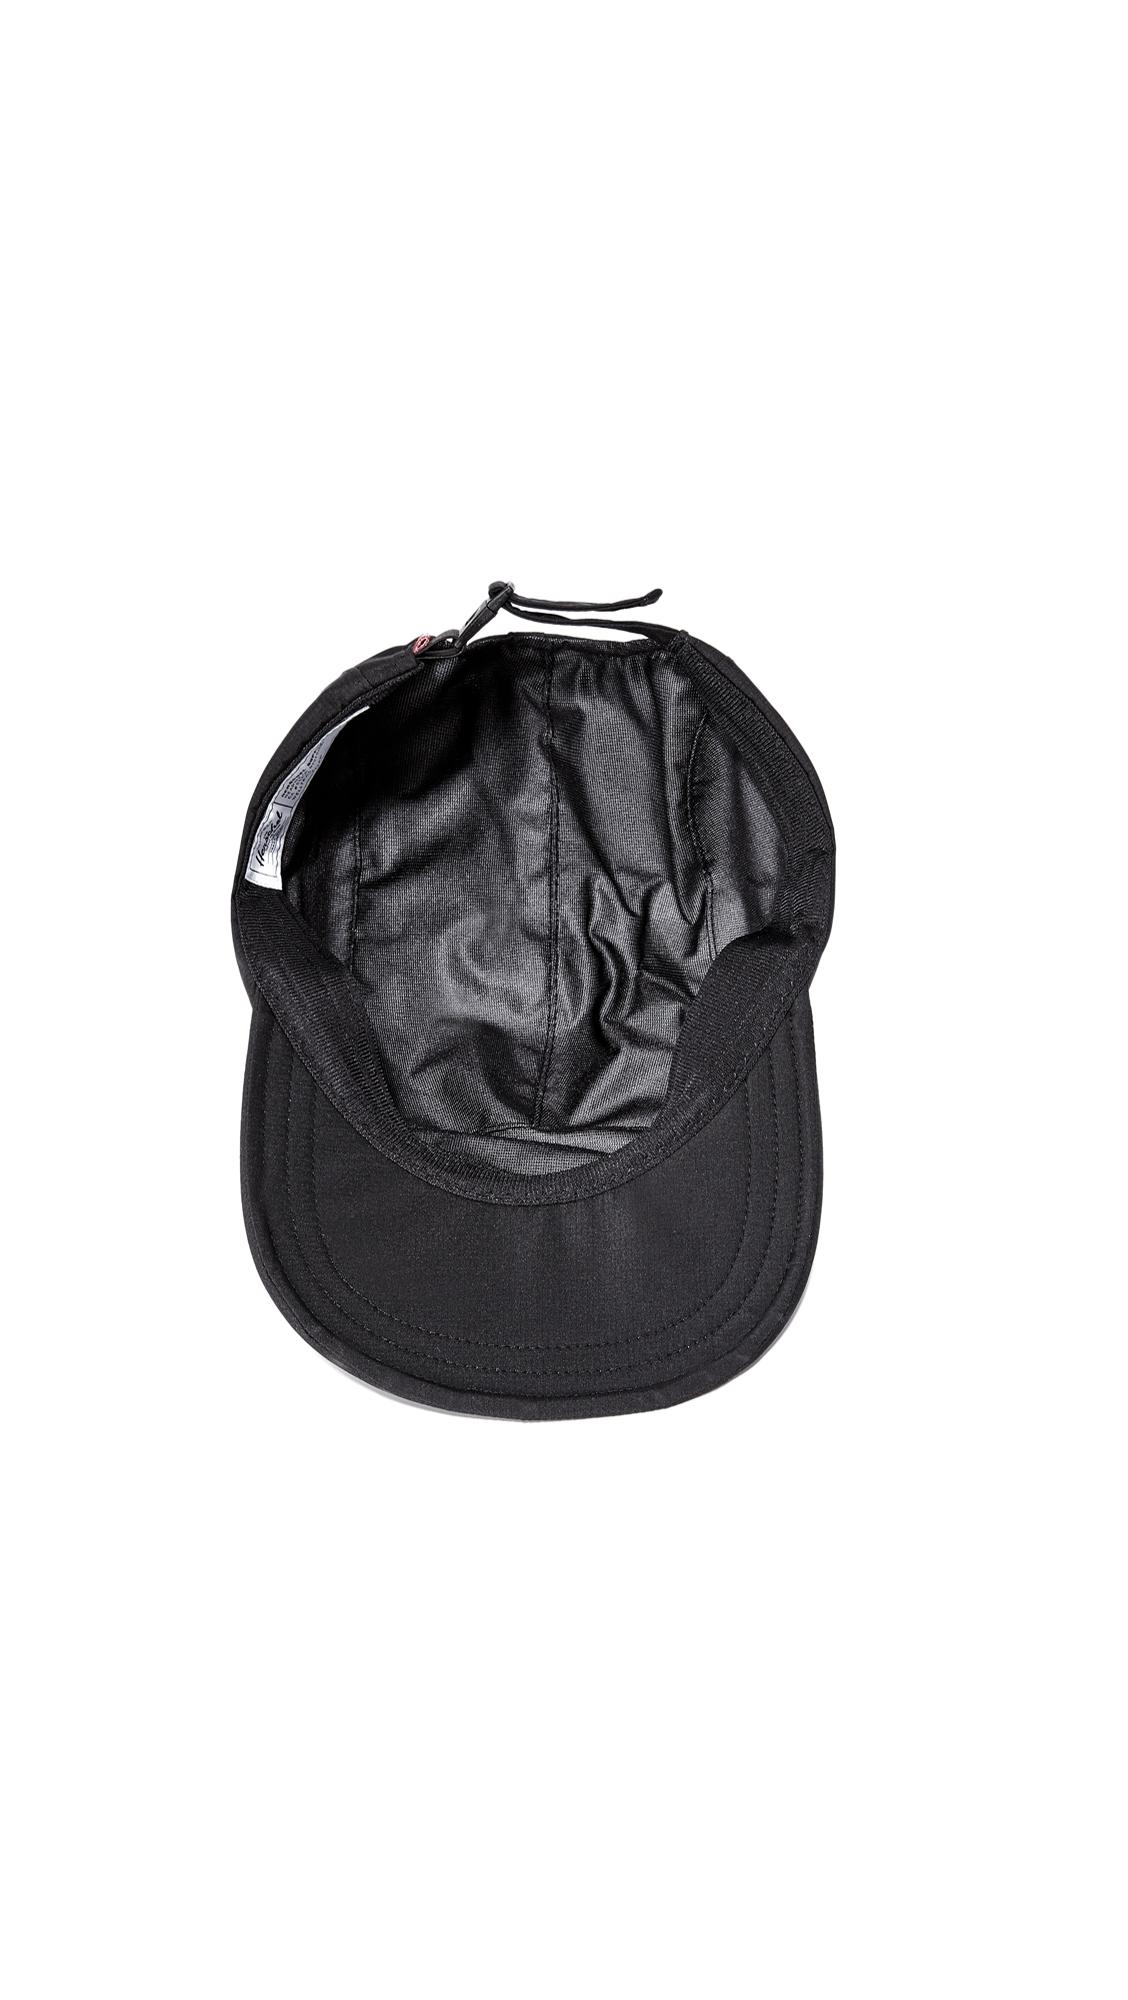 Lyst - Herschel Supply Co. Glendale Packable Gore-tex Cap in Black ... 67675bd4fc5e